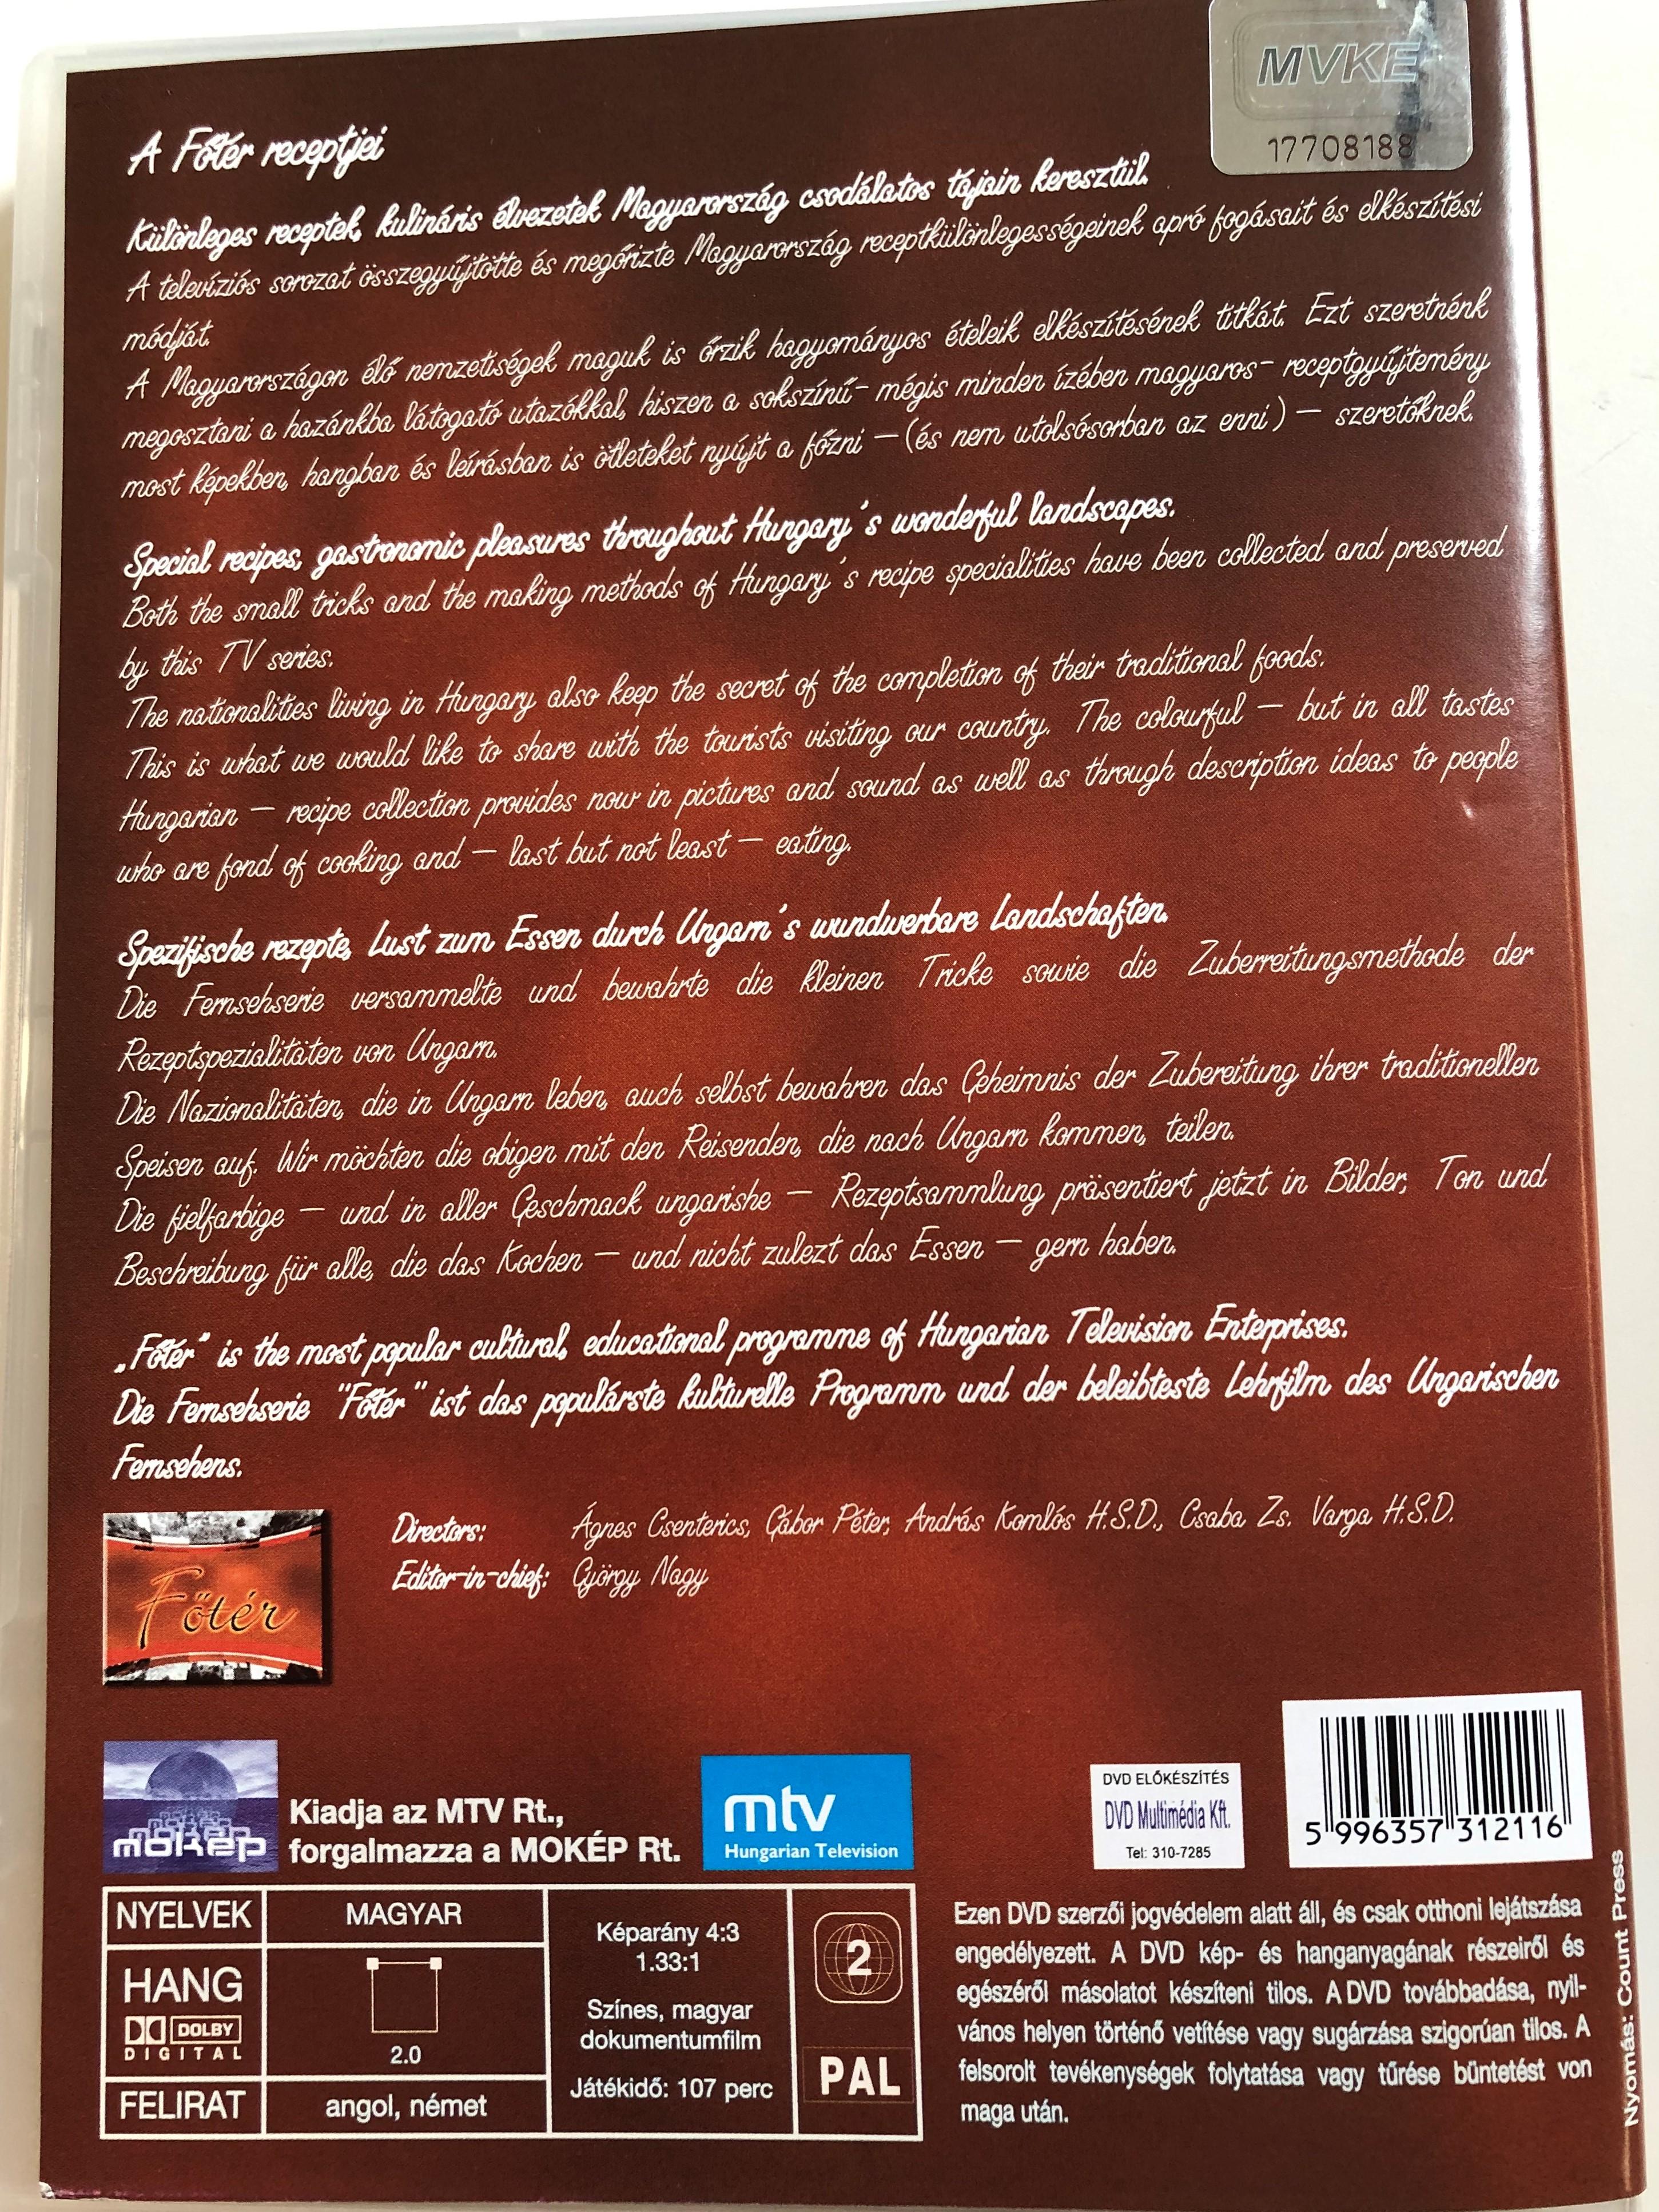 a-f-t-r-receptjei-dvd-special-recipes-spezifische-rezepte-directed-by-gnes-csenterics-4.jpg